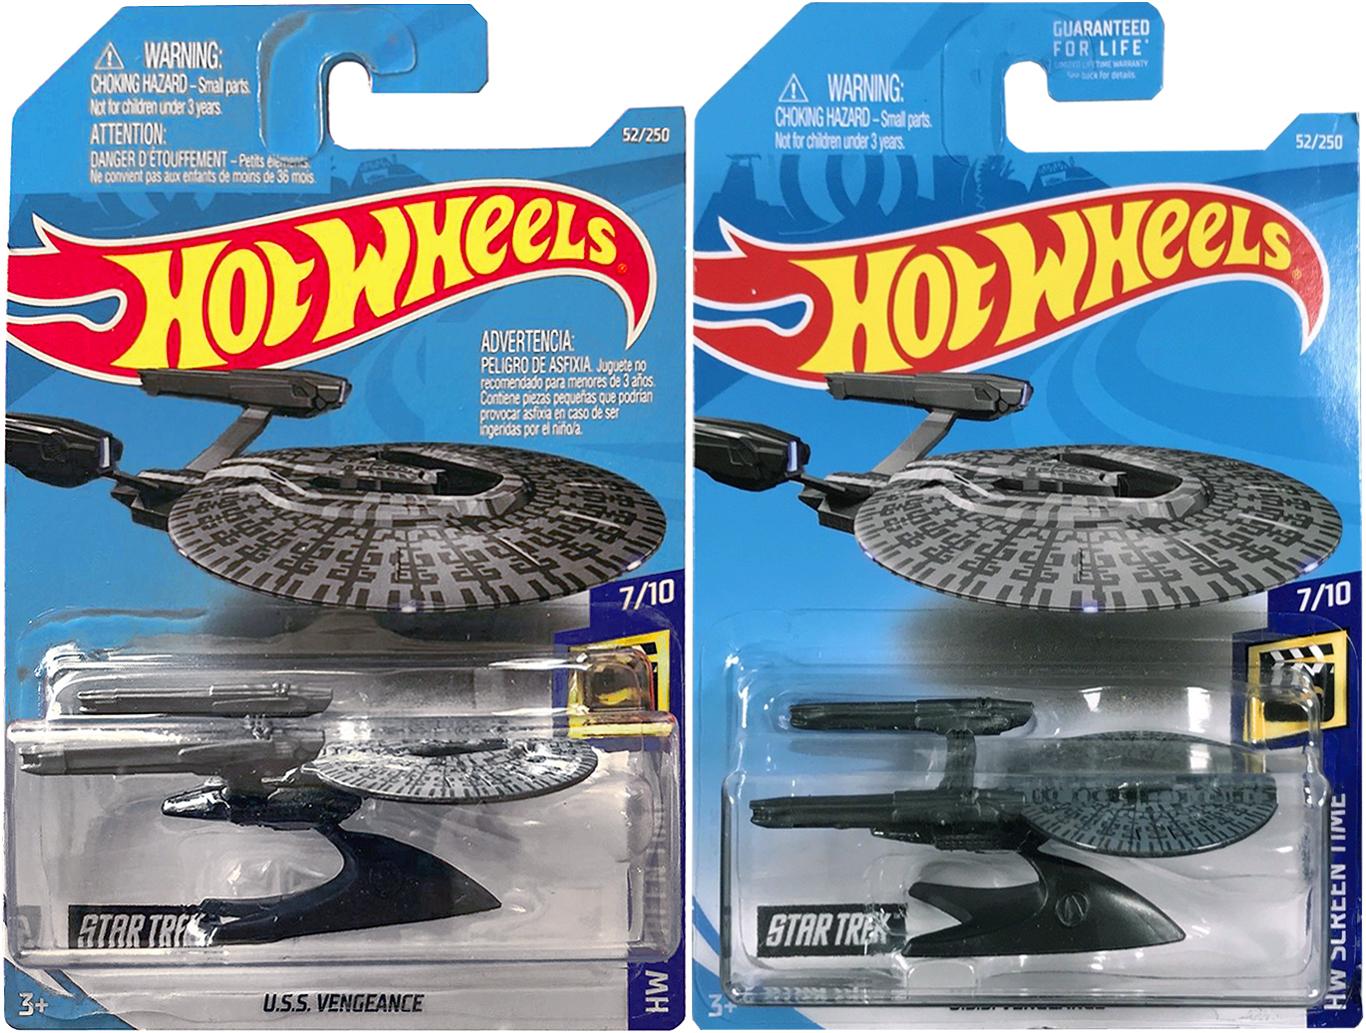 Uss Vengeance Hot Wheels Image - Hot Whe...